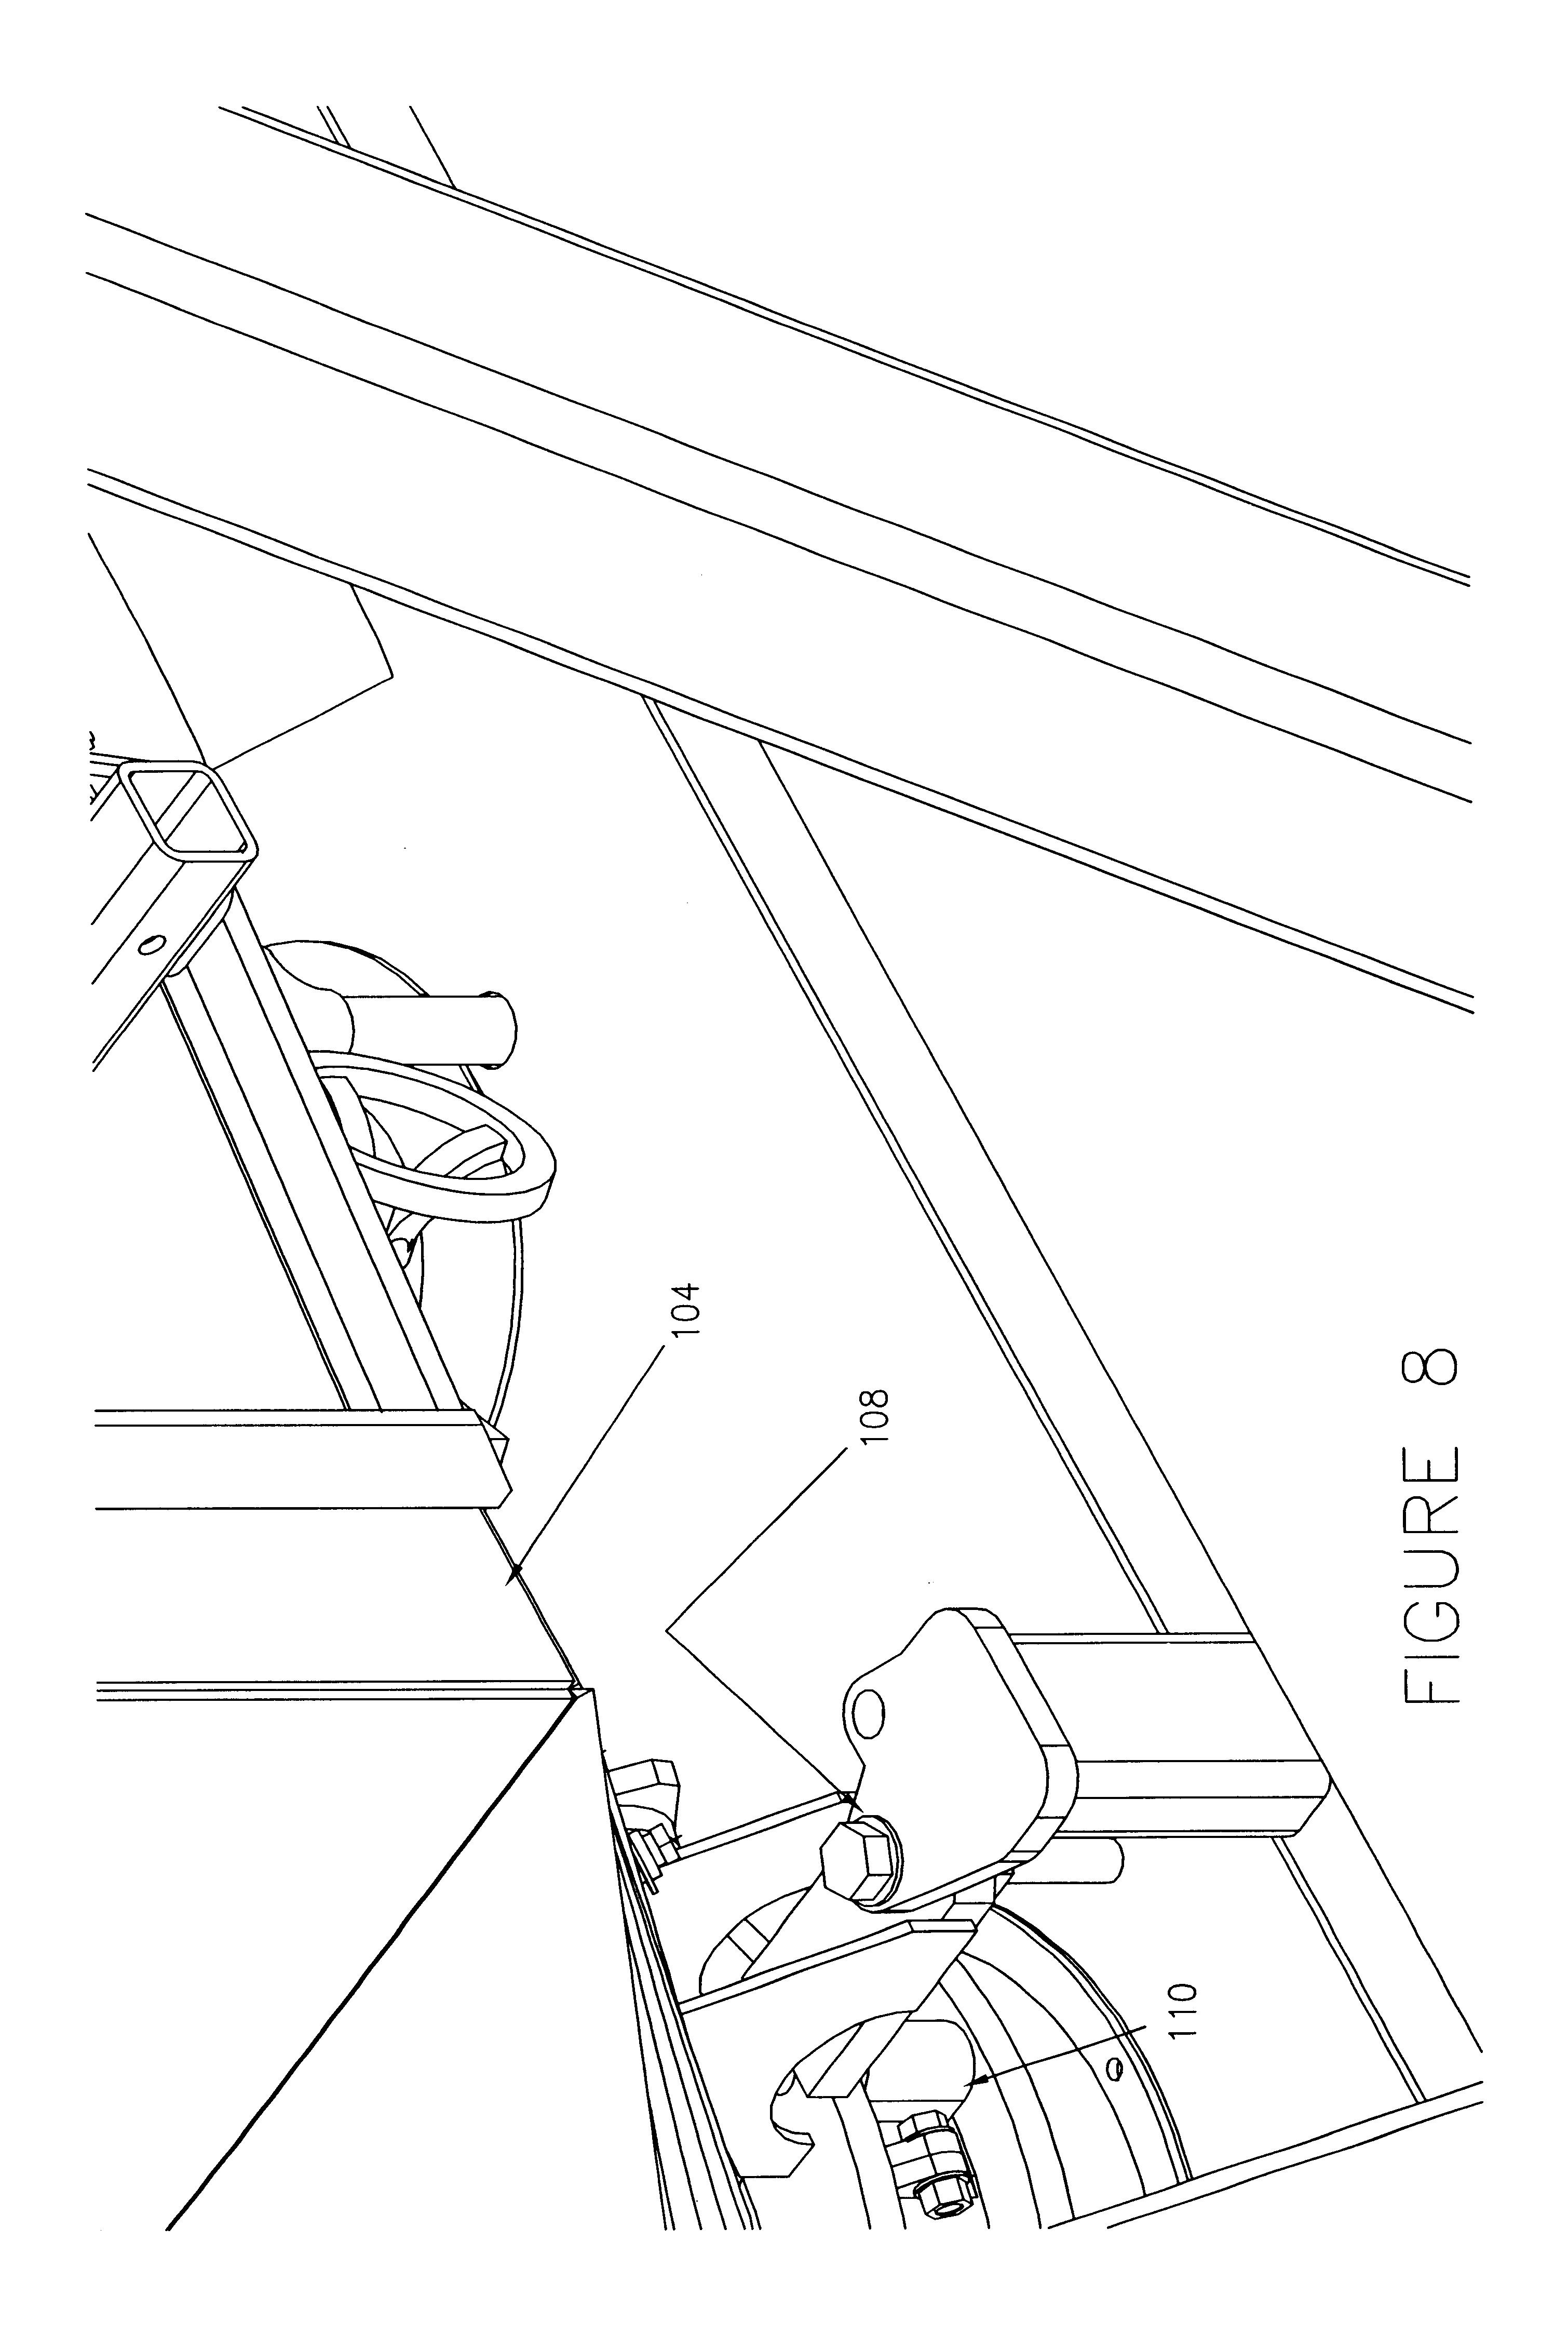 ibanez b guitar wiring schematics diagram  ibanez  get